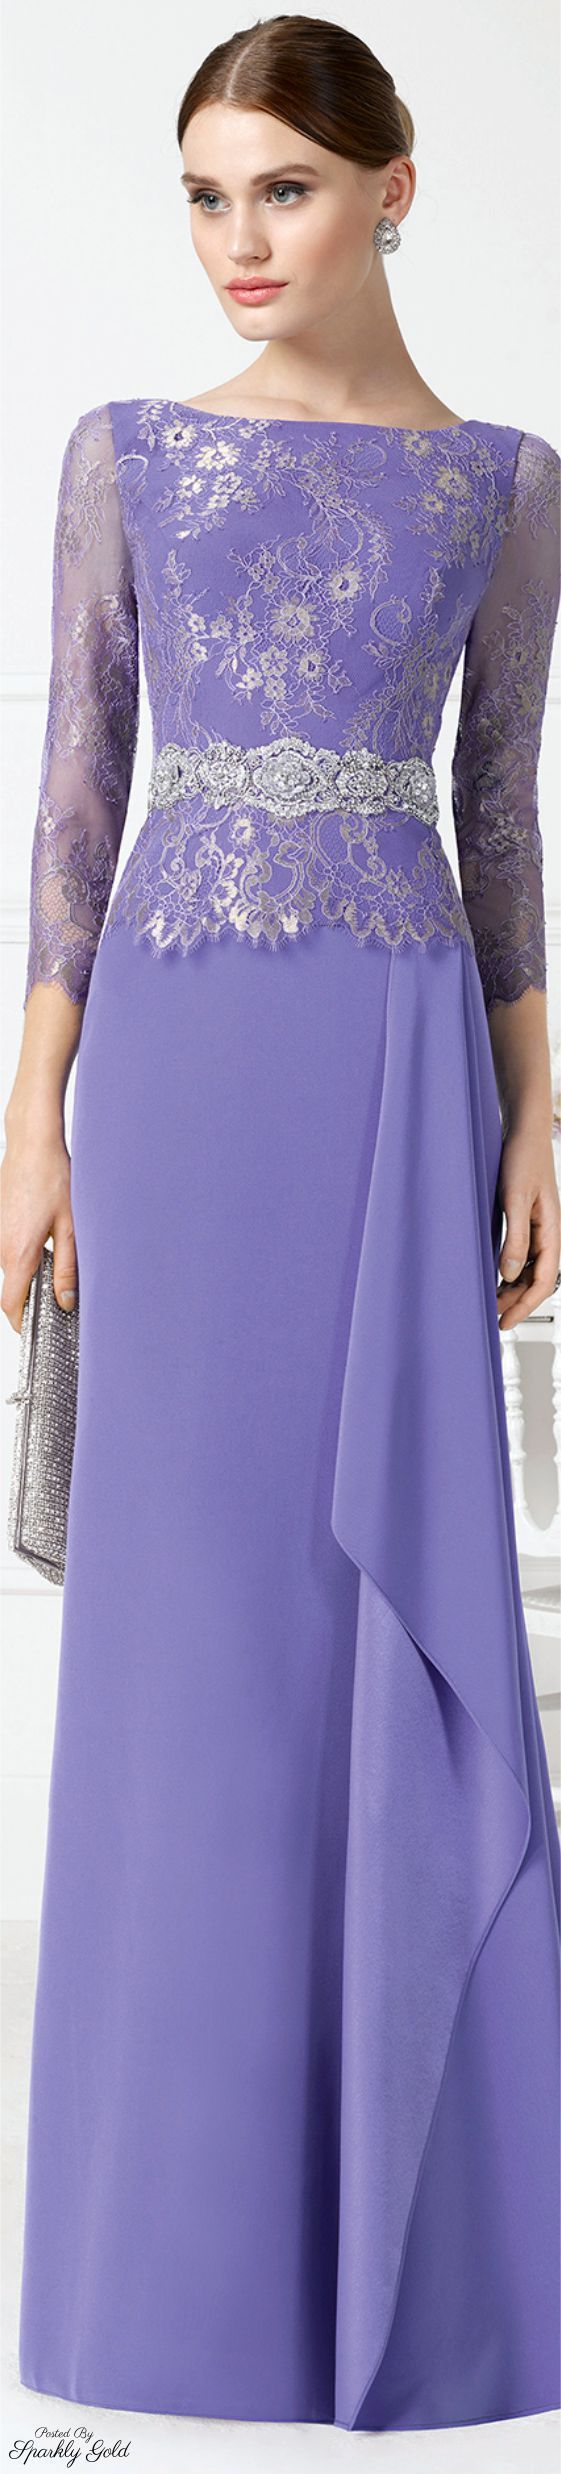 39 best Vestidos de noche images on Pinterest | Formal prom dresses ...